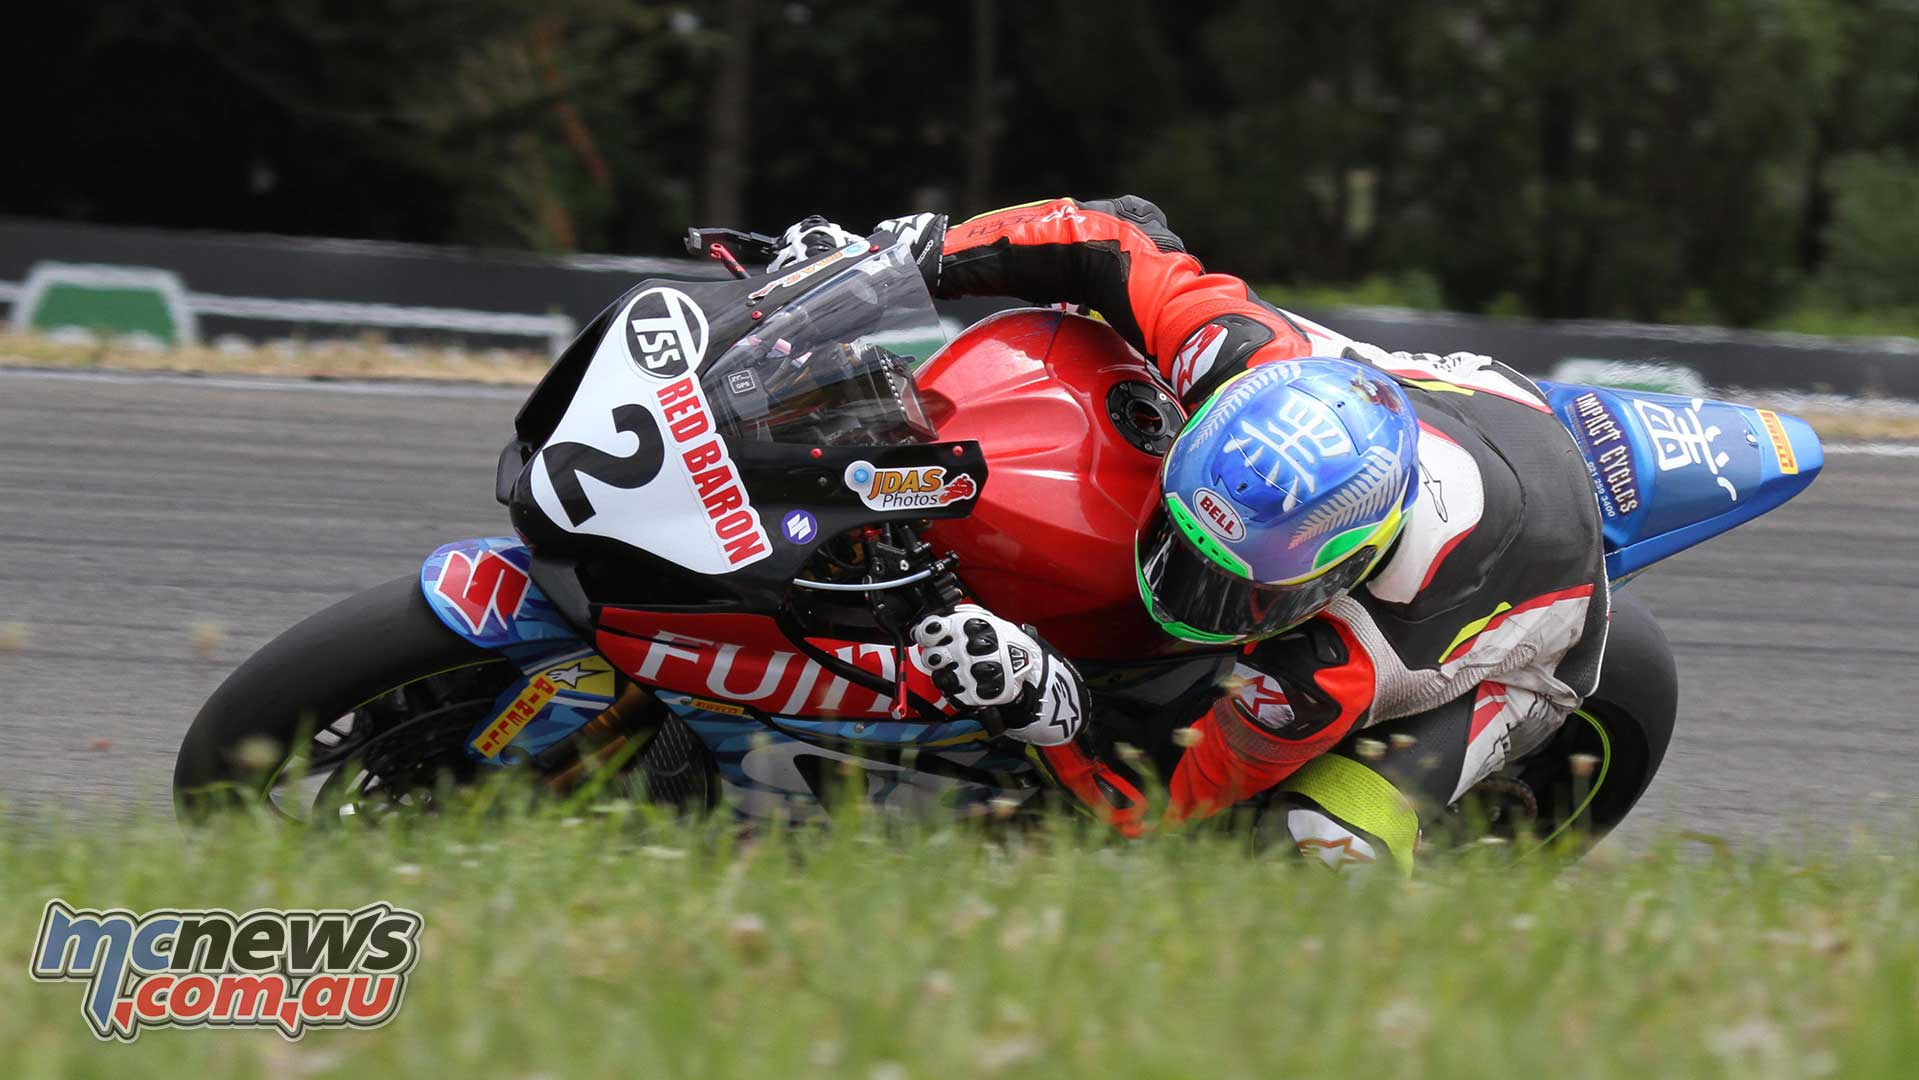 Sloan Frost won race two at Manfeild on his Suzuki GSX-R1000